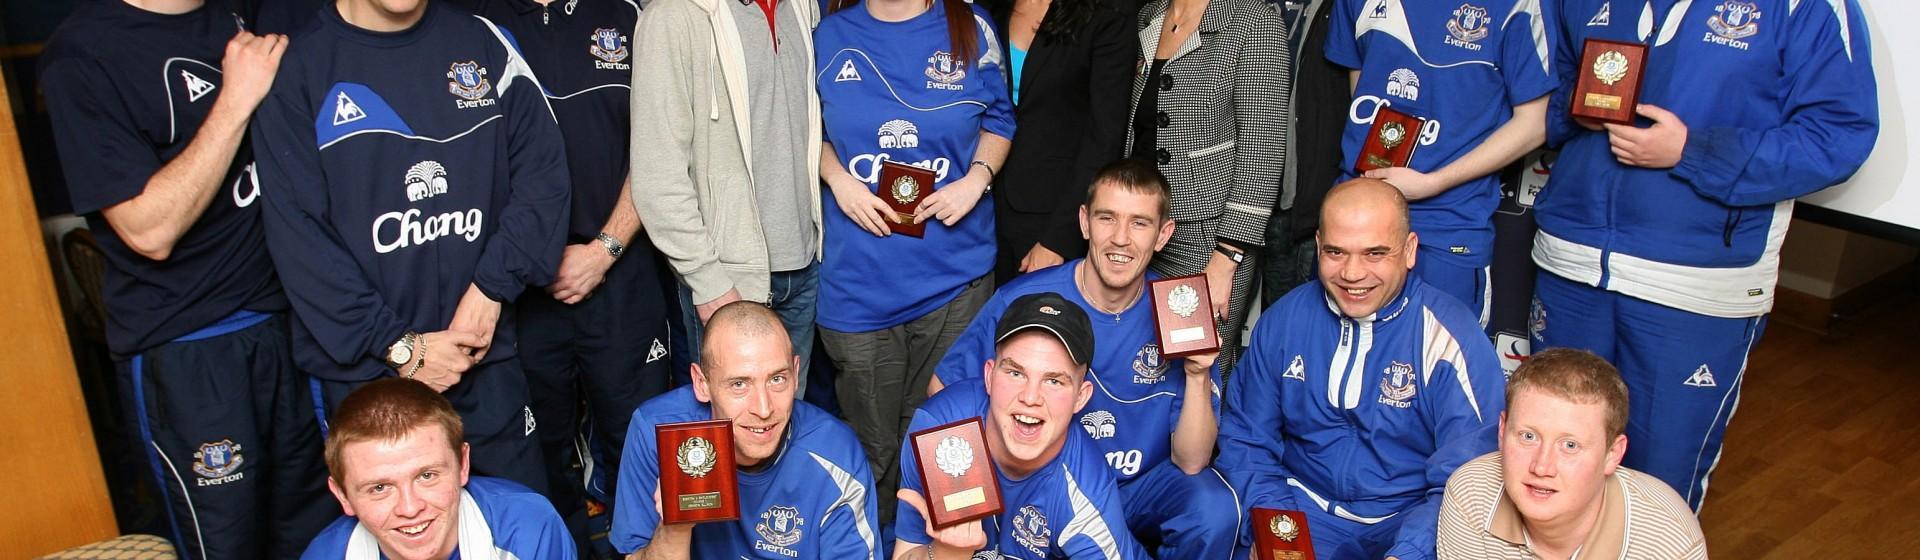 Everton's Tony Hibbert presents awards at Goodison Park